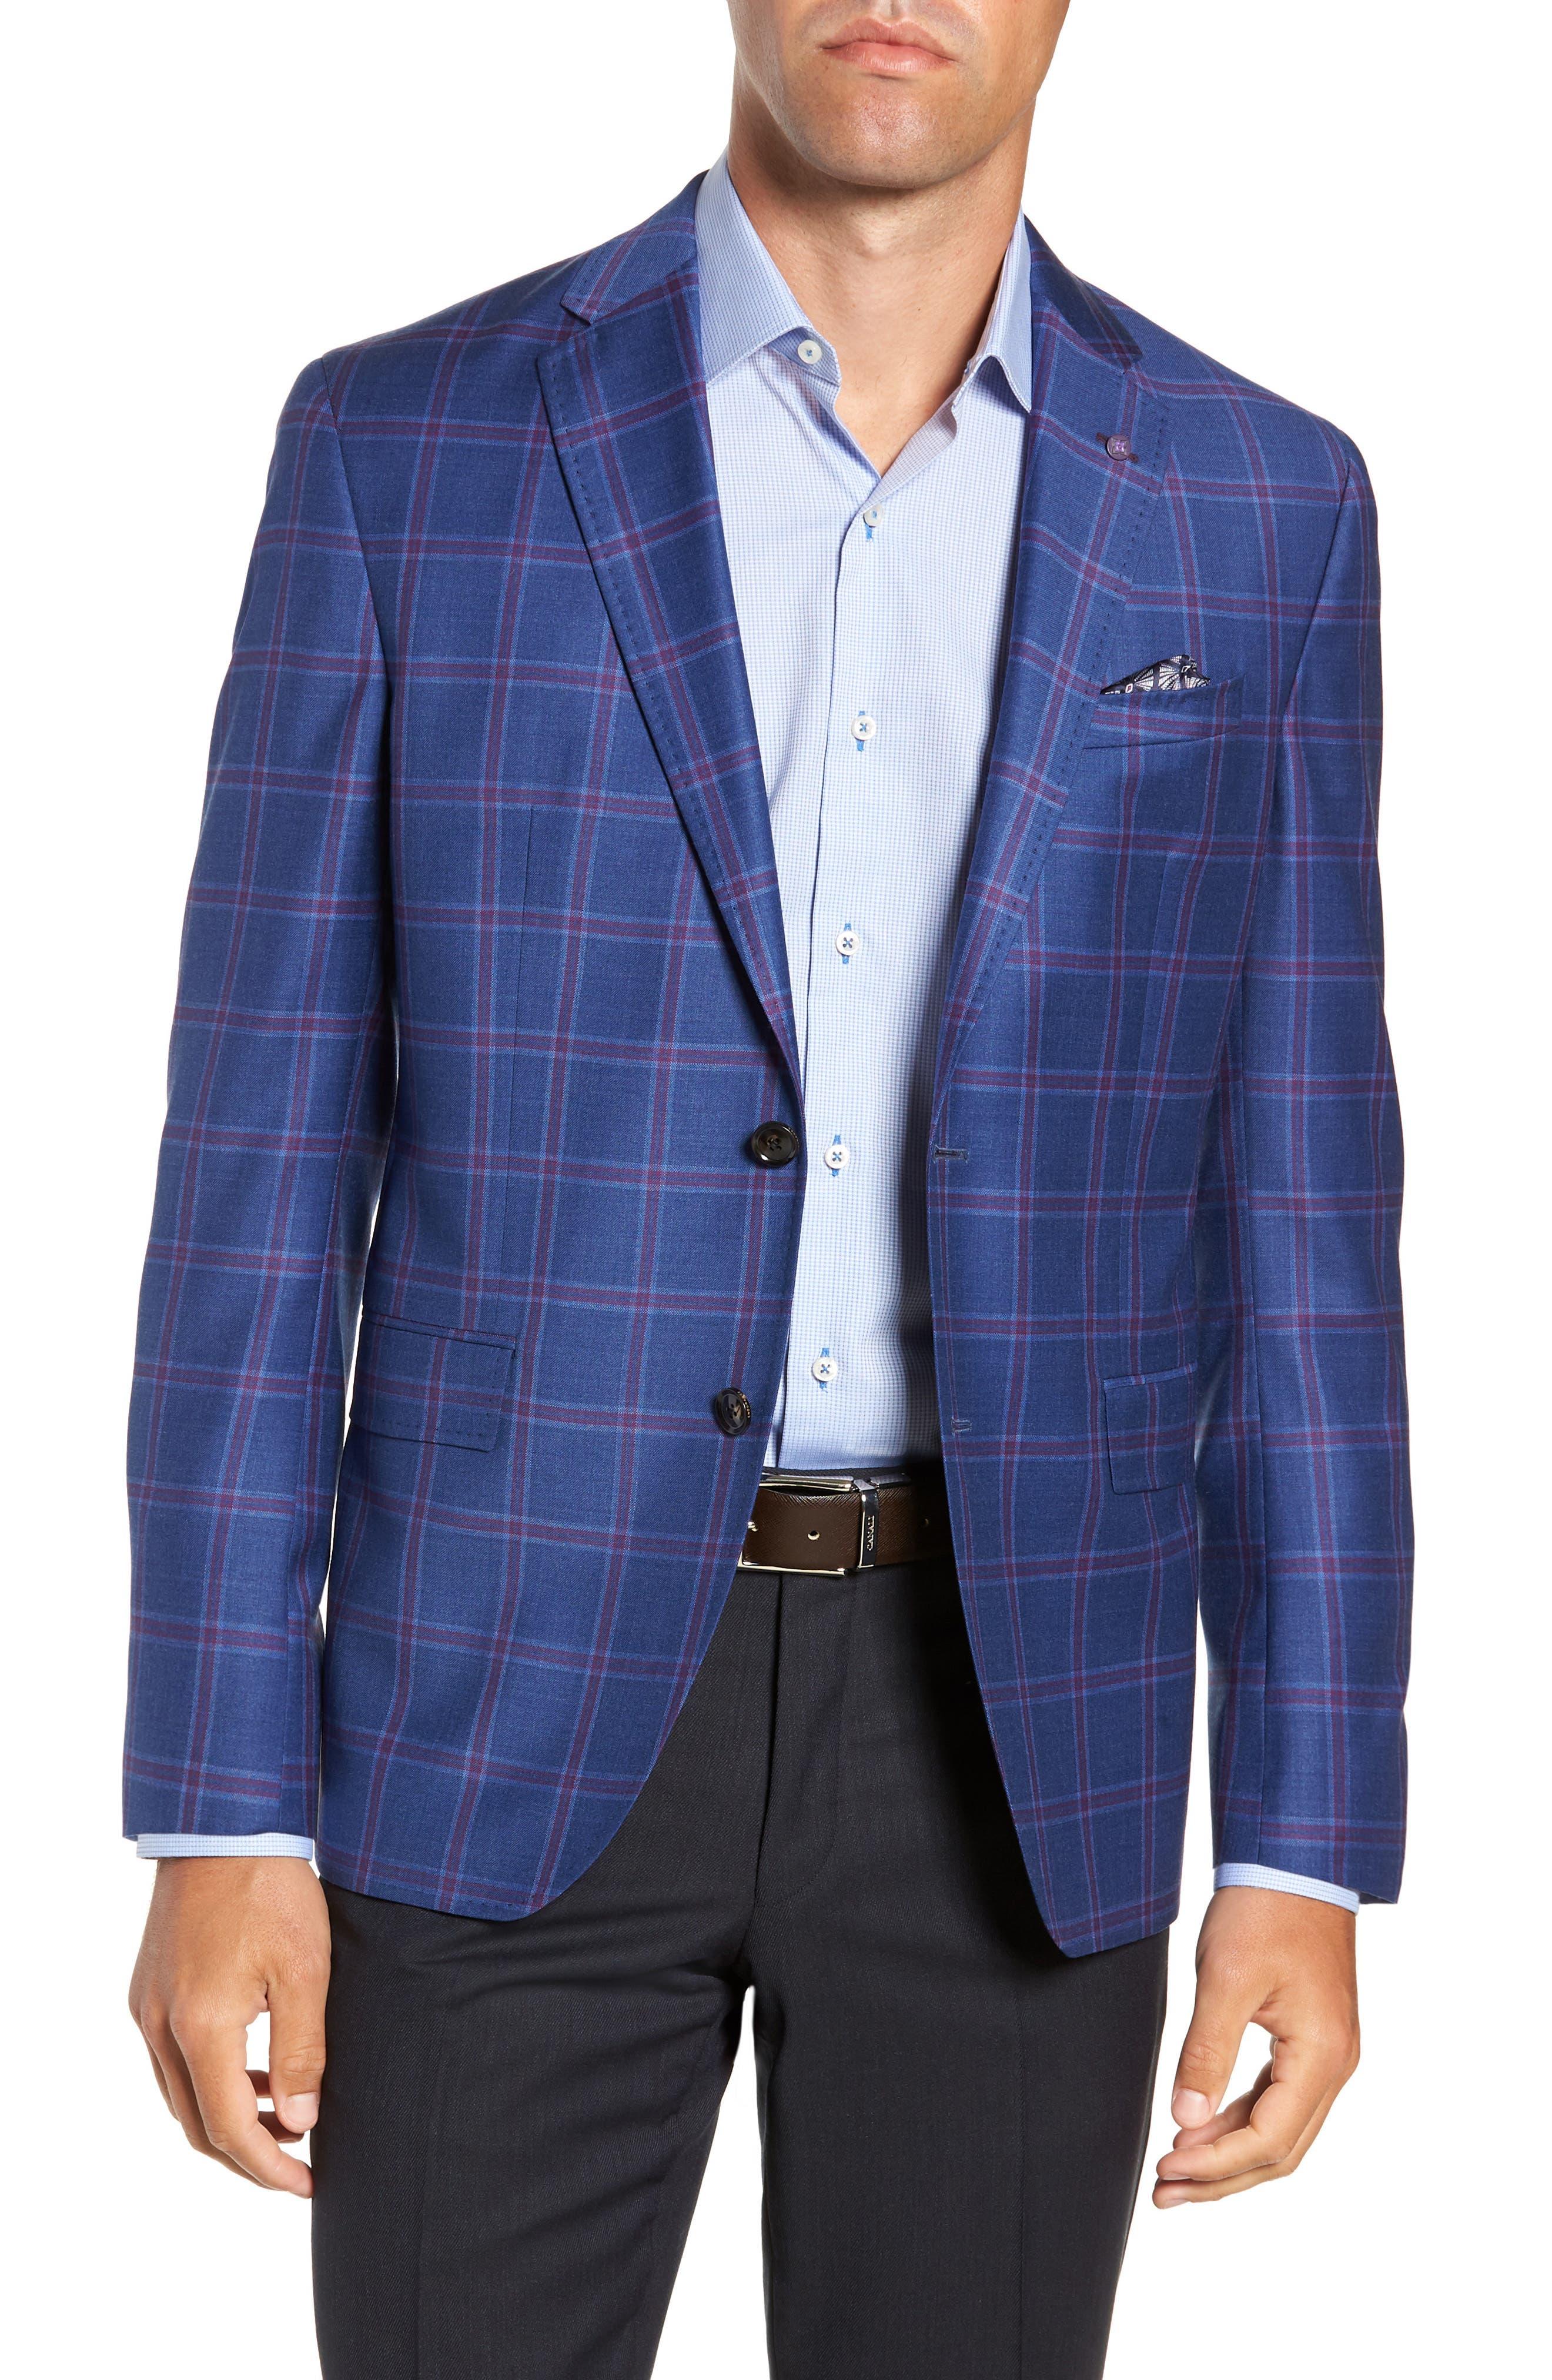 TED BAKER LONDON Konan Trim Fit Wool Sport Coat, Main, color, BLUE